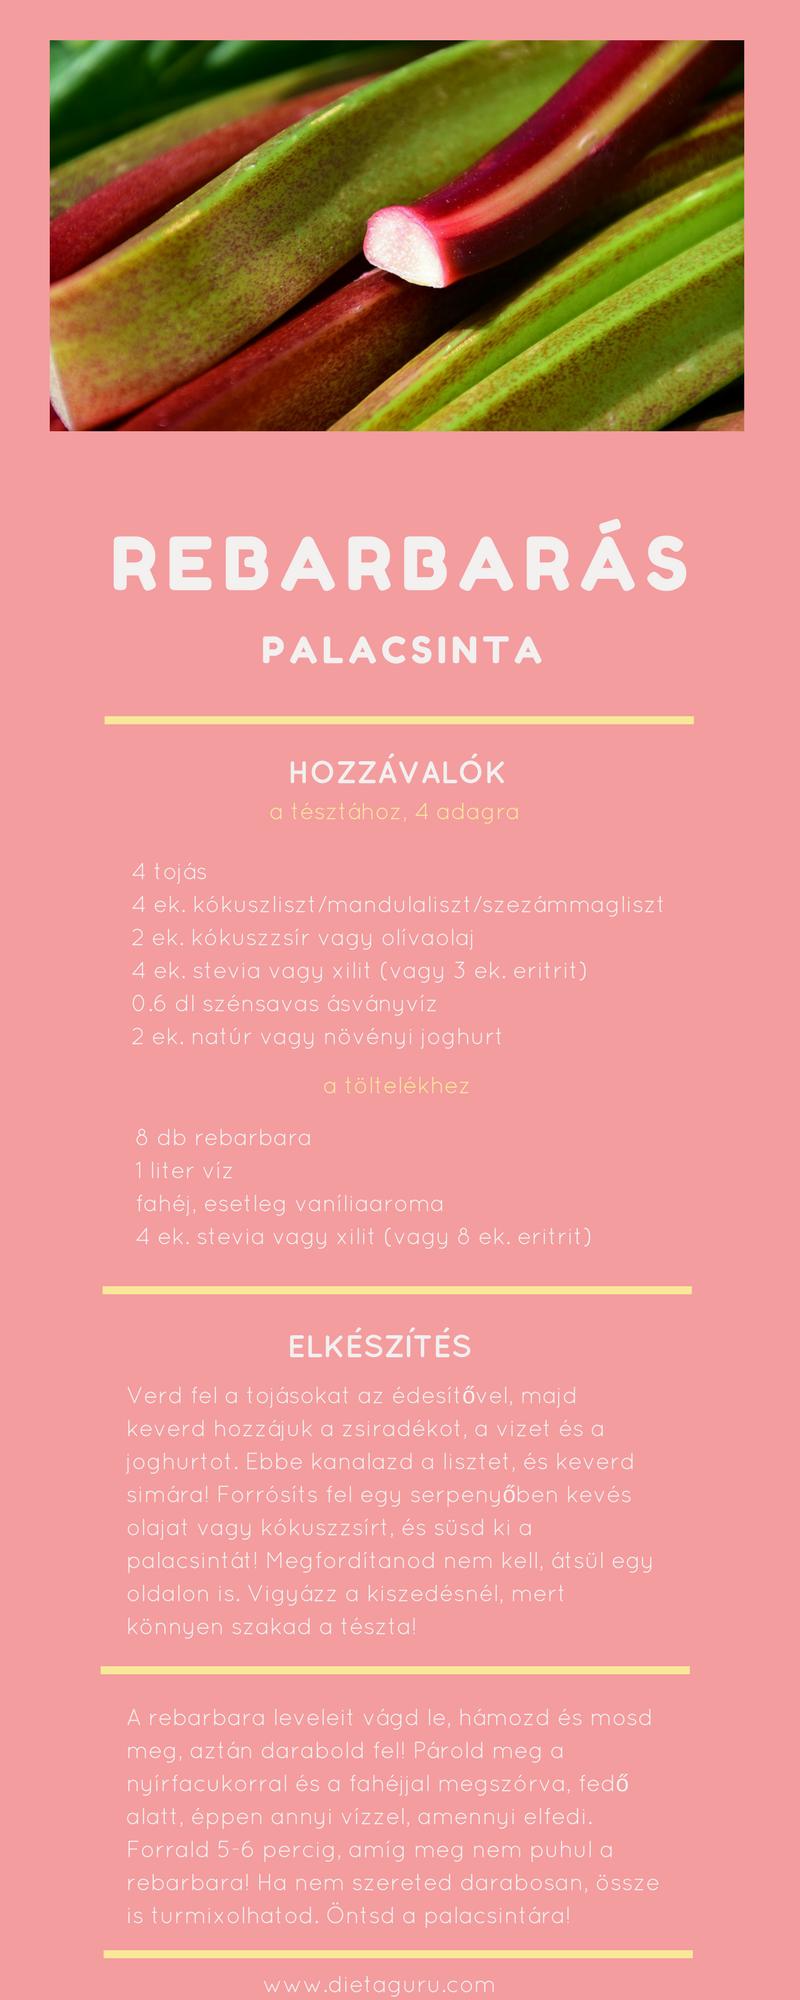 rebarbaras_palacsinta.png